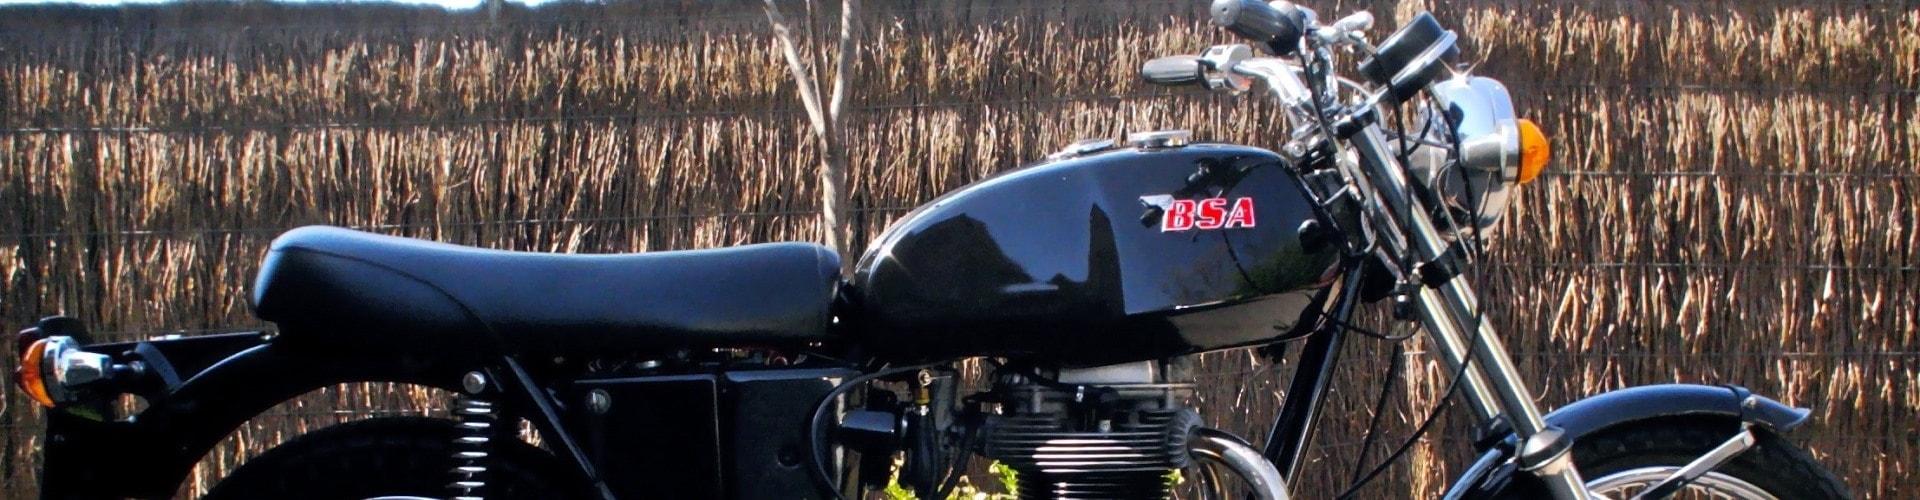 bsa-1972-thunderbolt-motorbike